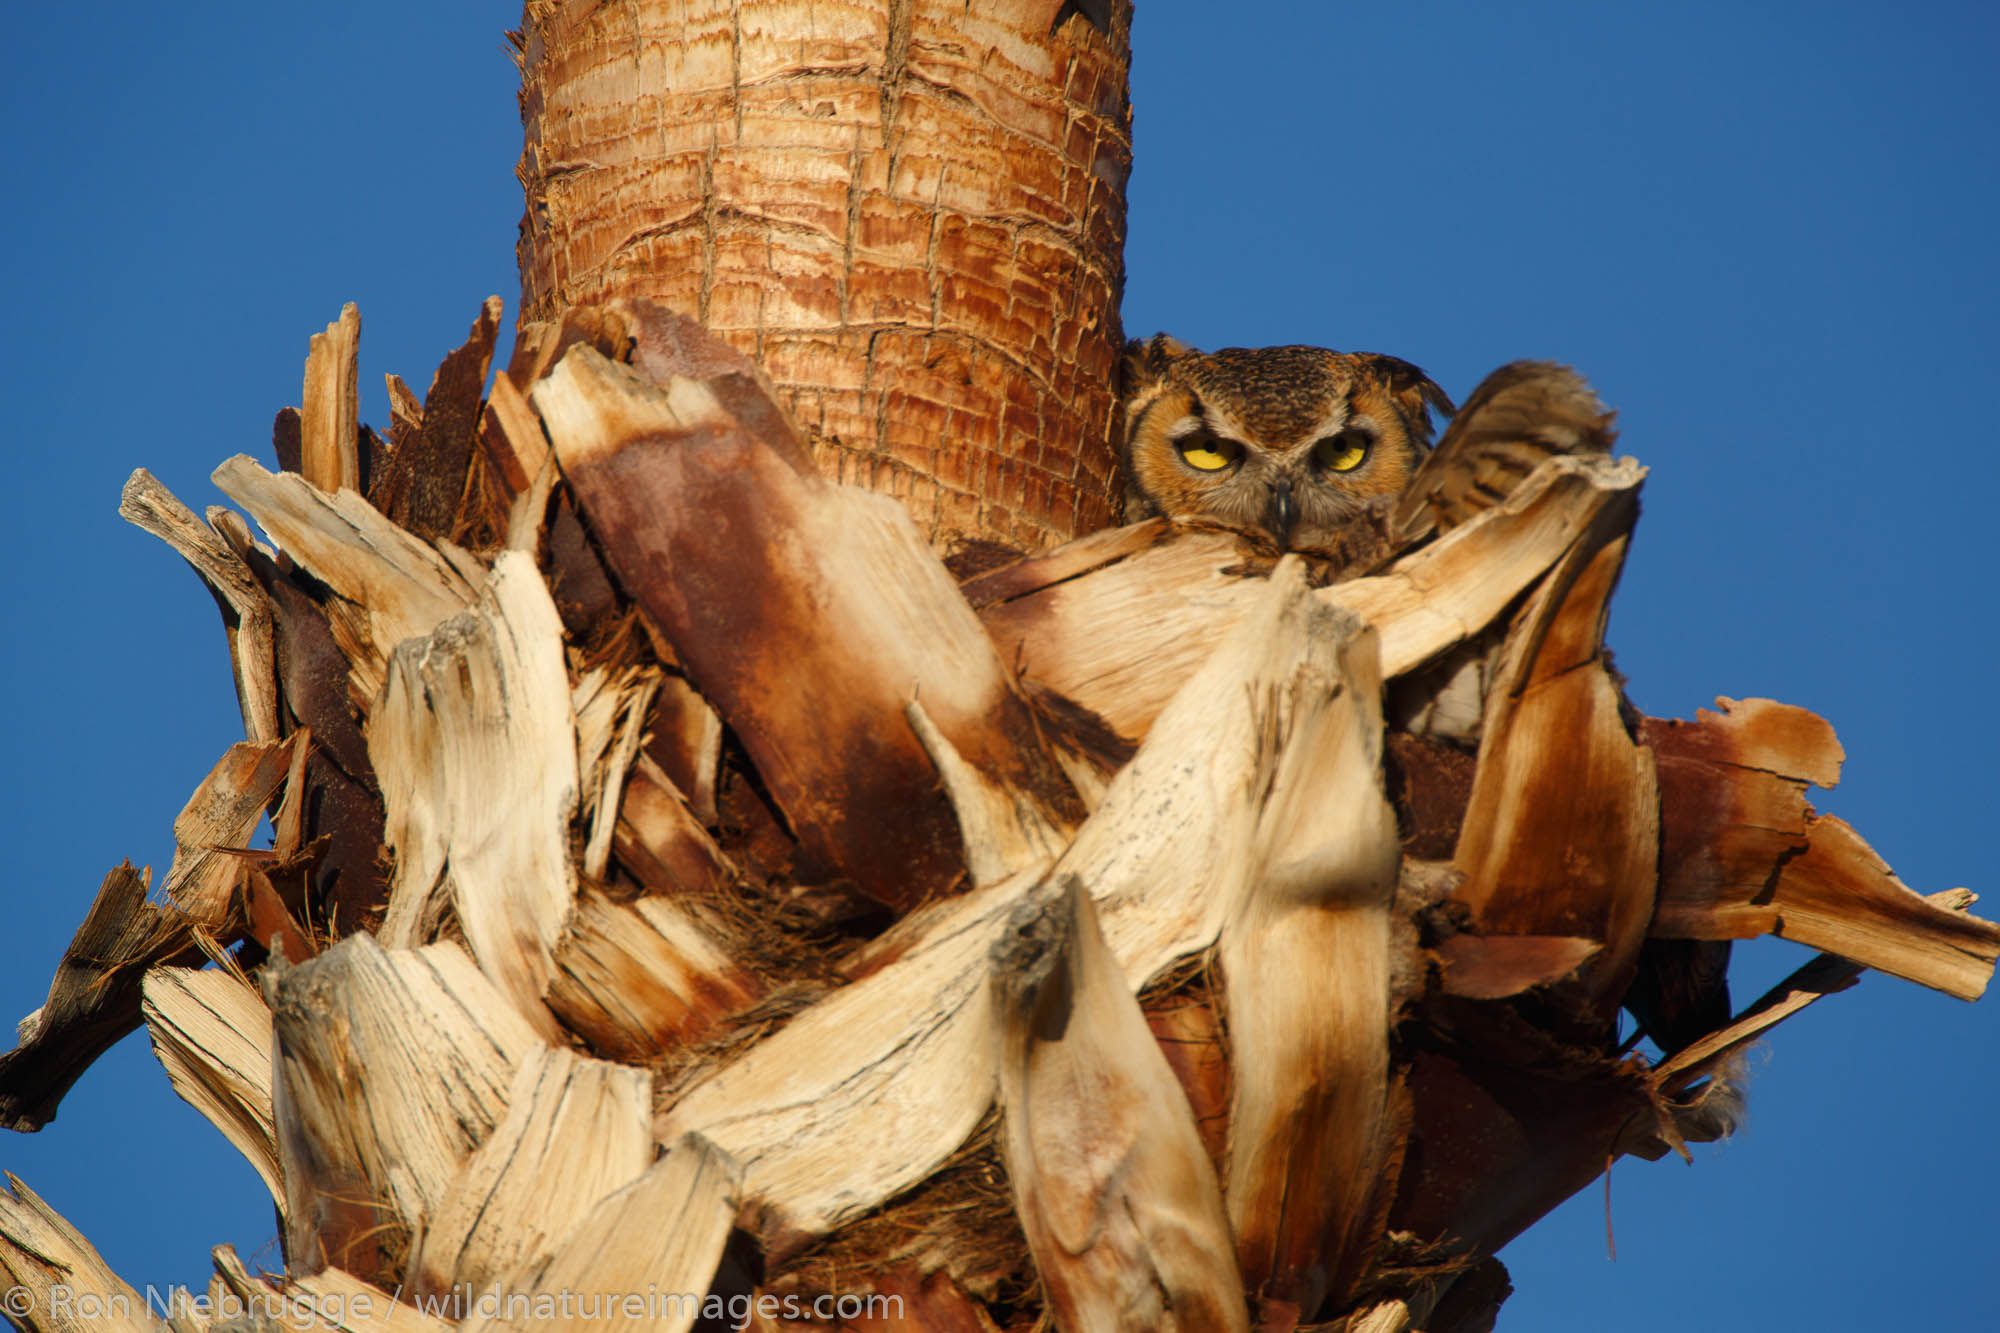 Great Horned Owl, (Bubo virginianus), Anza-Borrego Desert State Park, California.